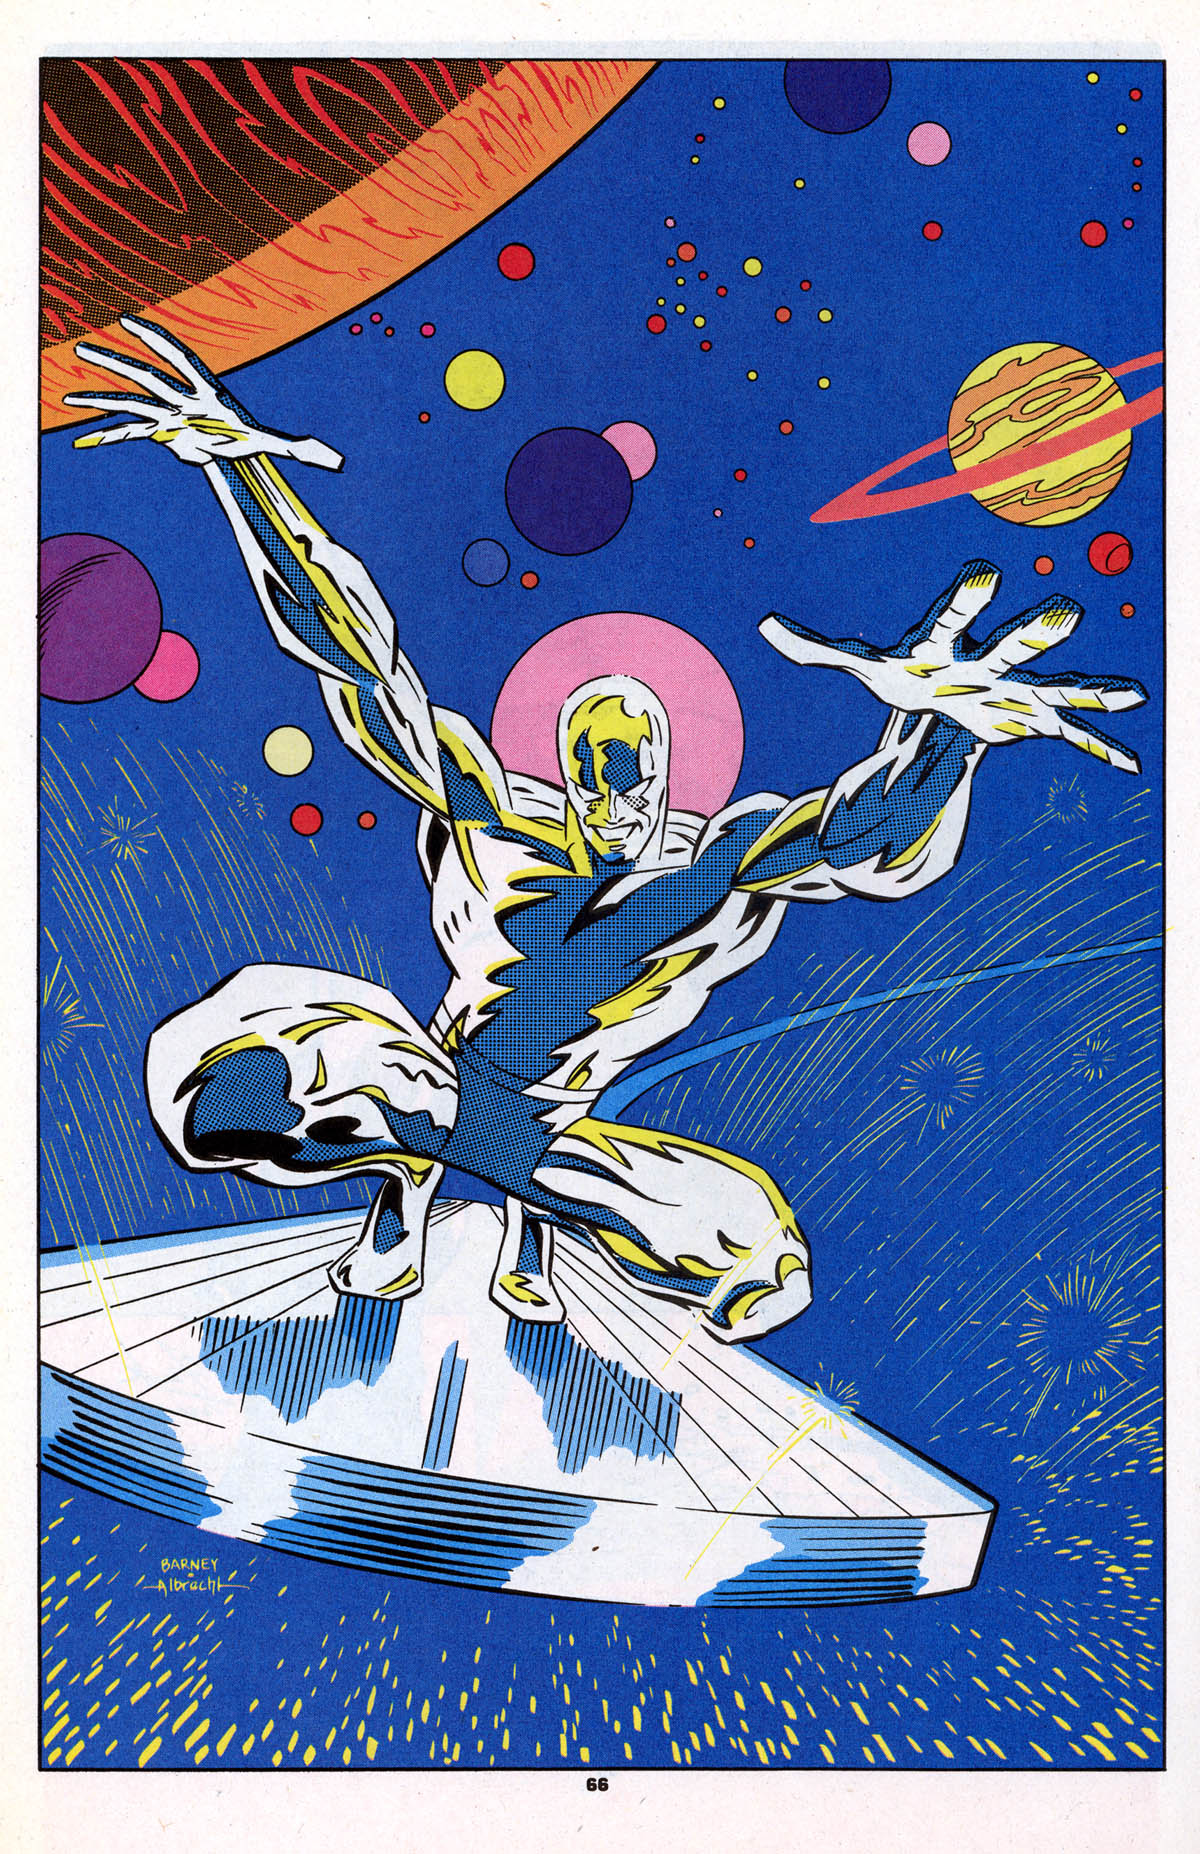 Marvel Super Heroes (1990) #15 pg 66, penciled by Joe Barney & inked by Jeff Albrecht.